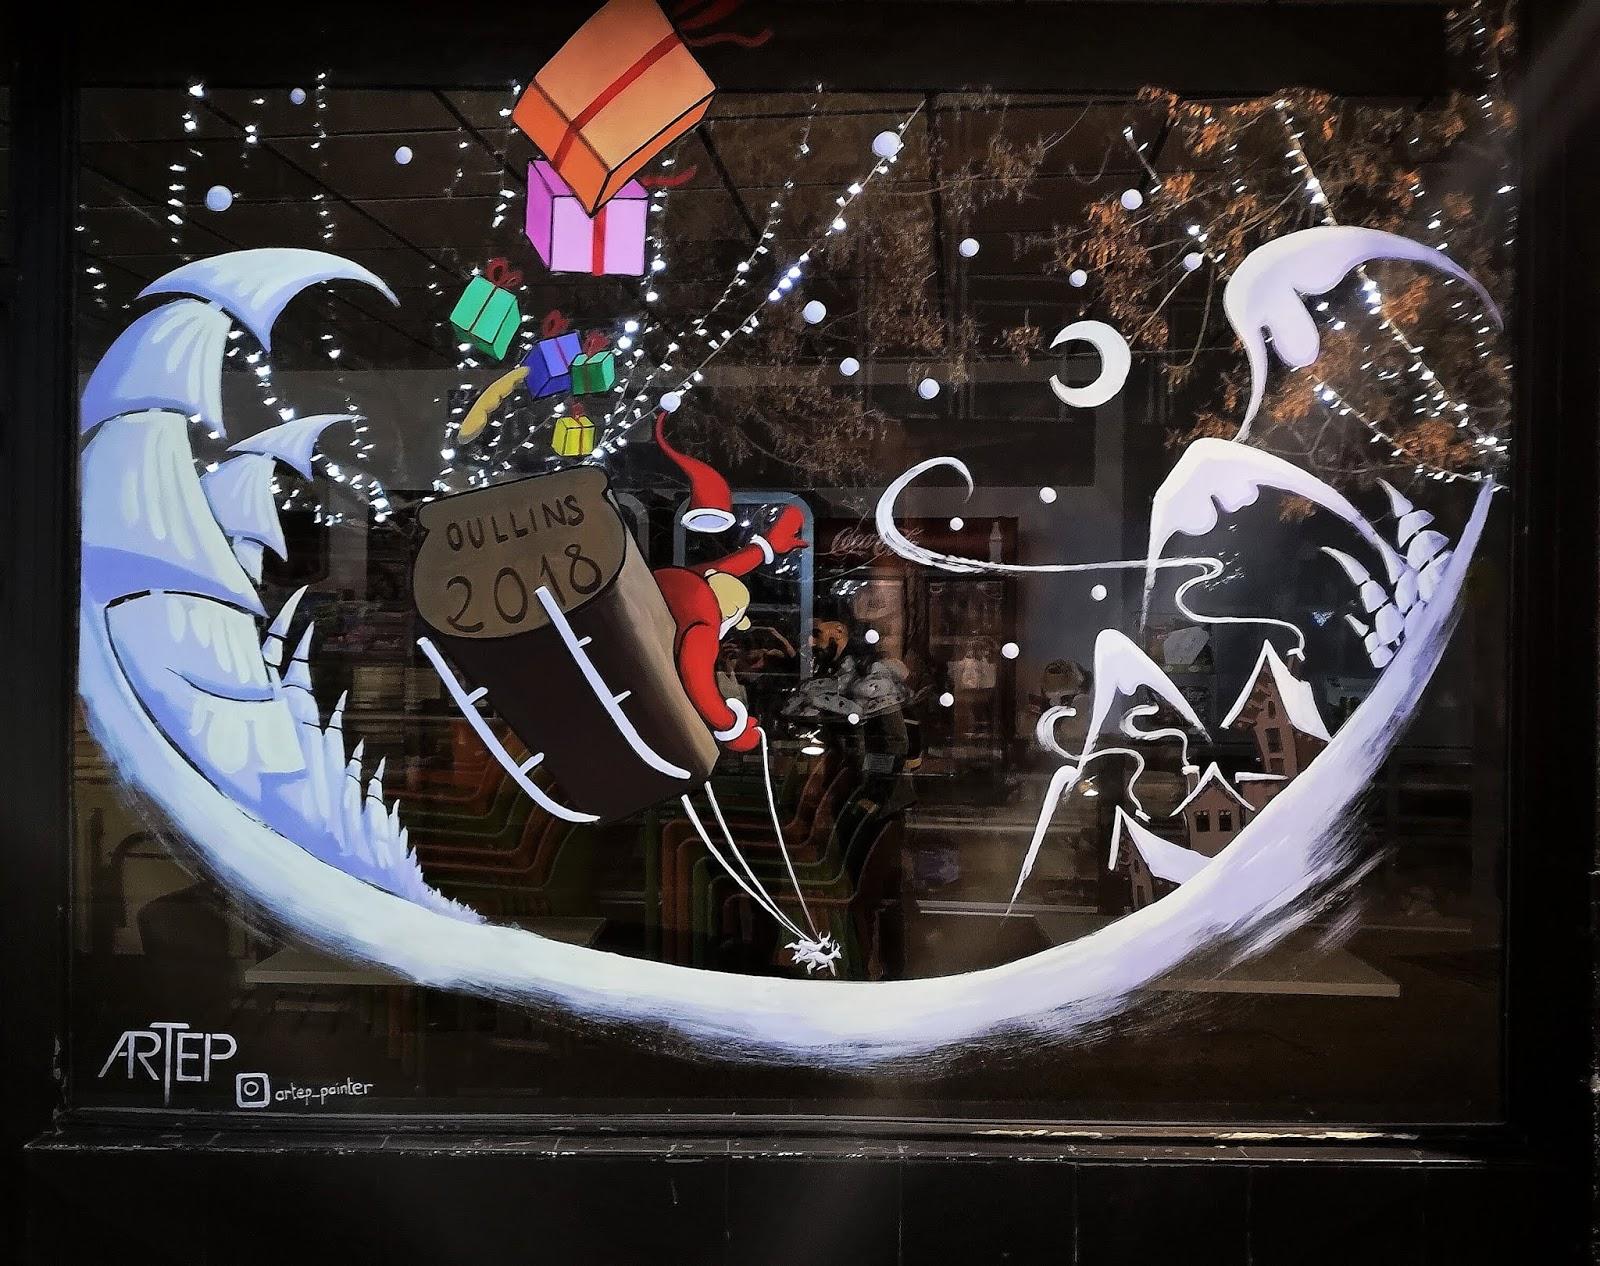 Artep Peinture Murale Dessin